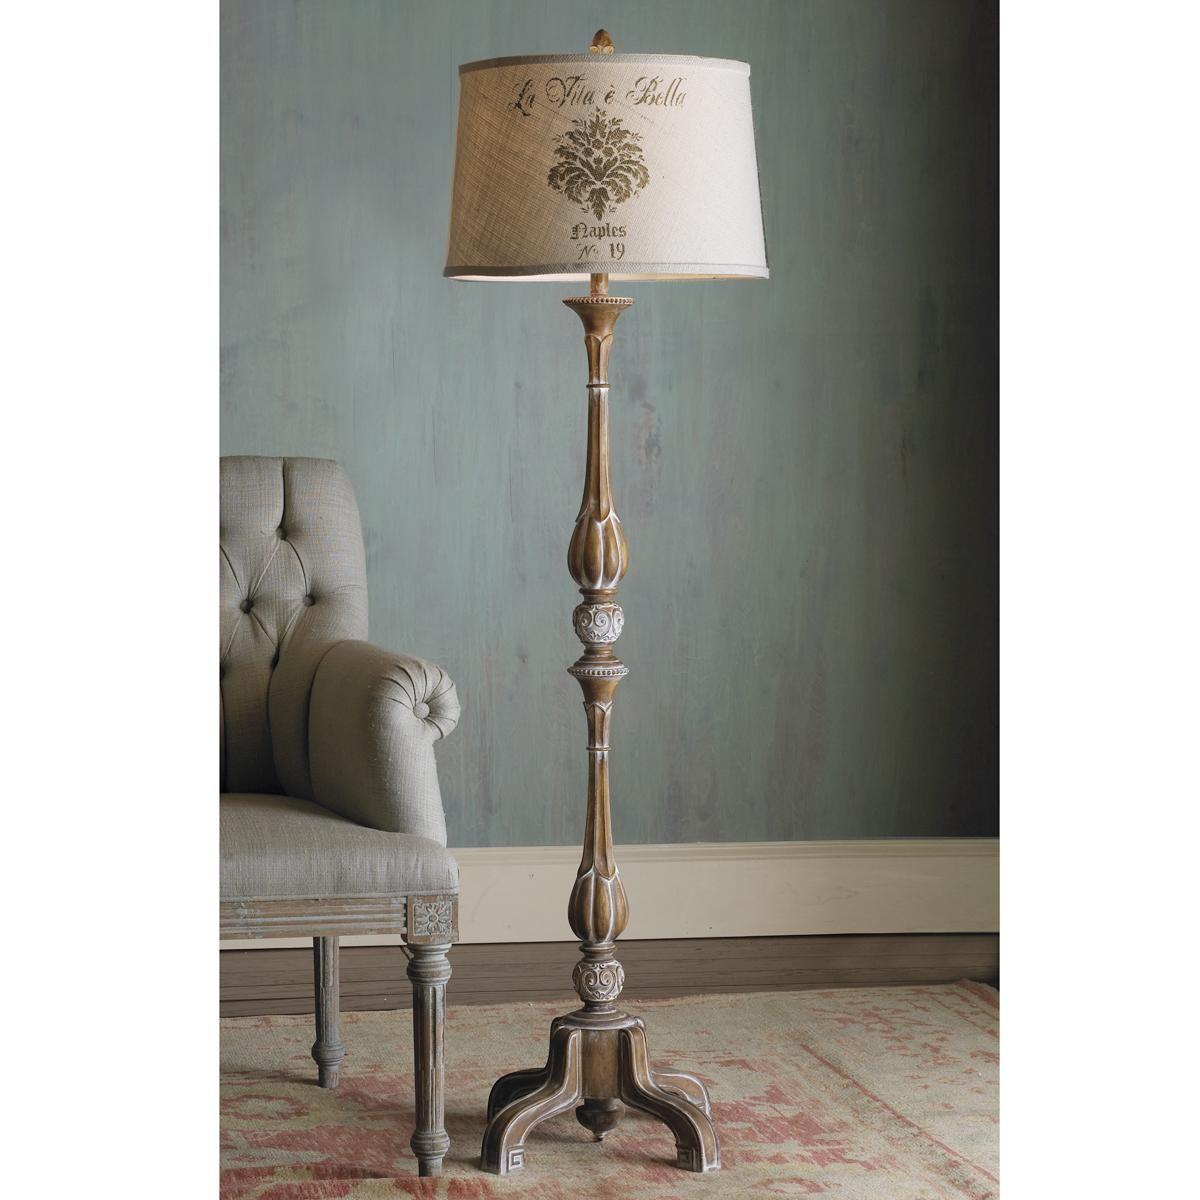 French Provincial Pickled Wood Floor Lamp Ideias De Iluminacao Candeeiros De Pe Lanternas Flutuantes